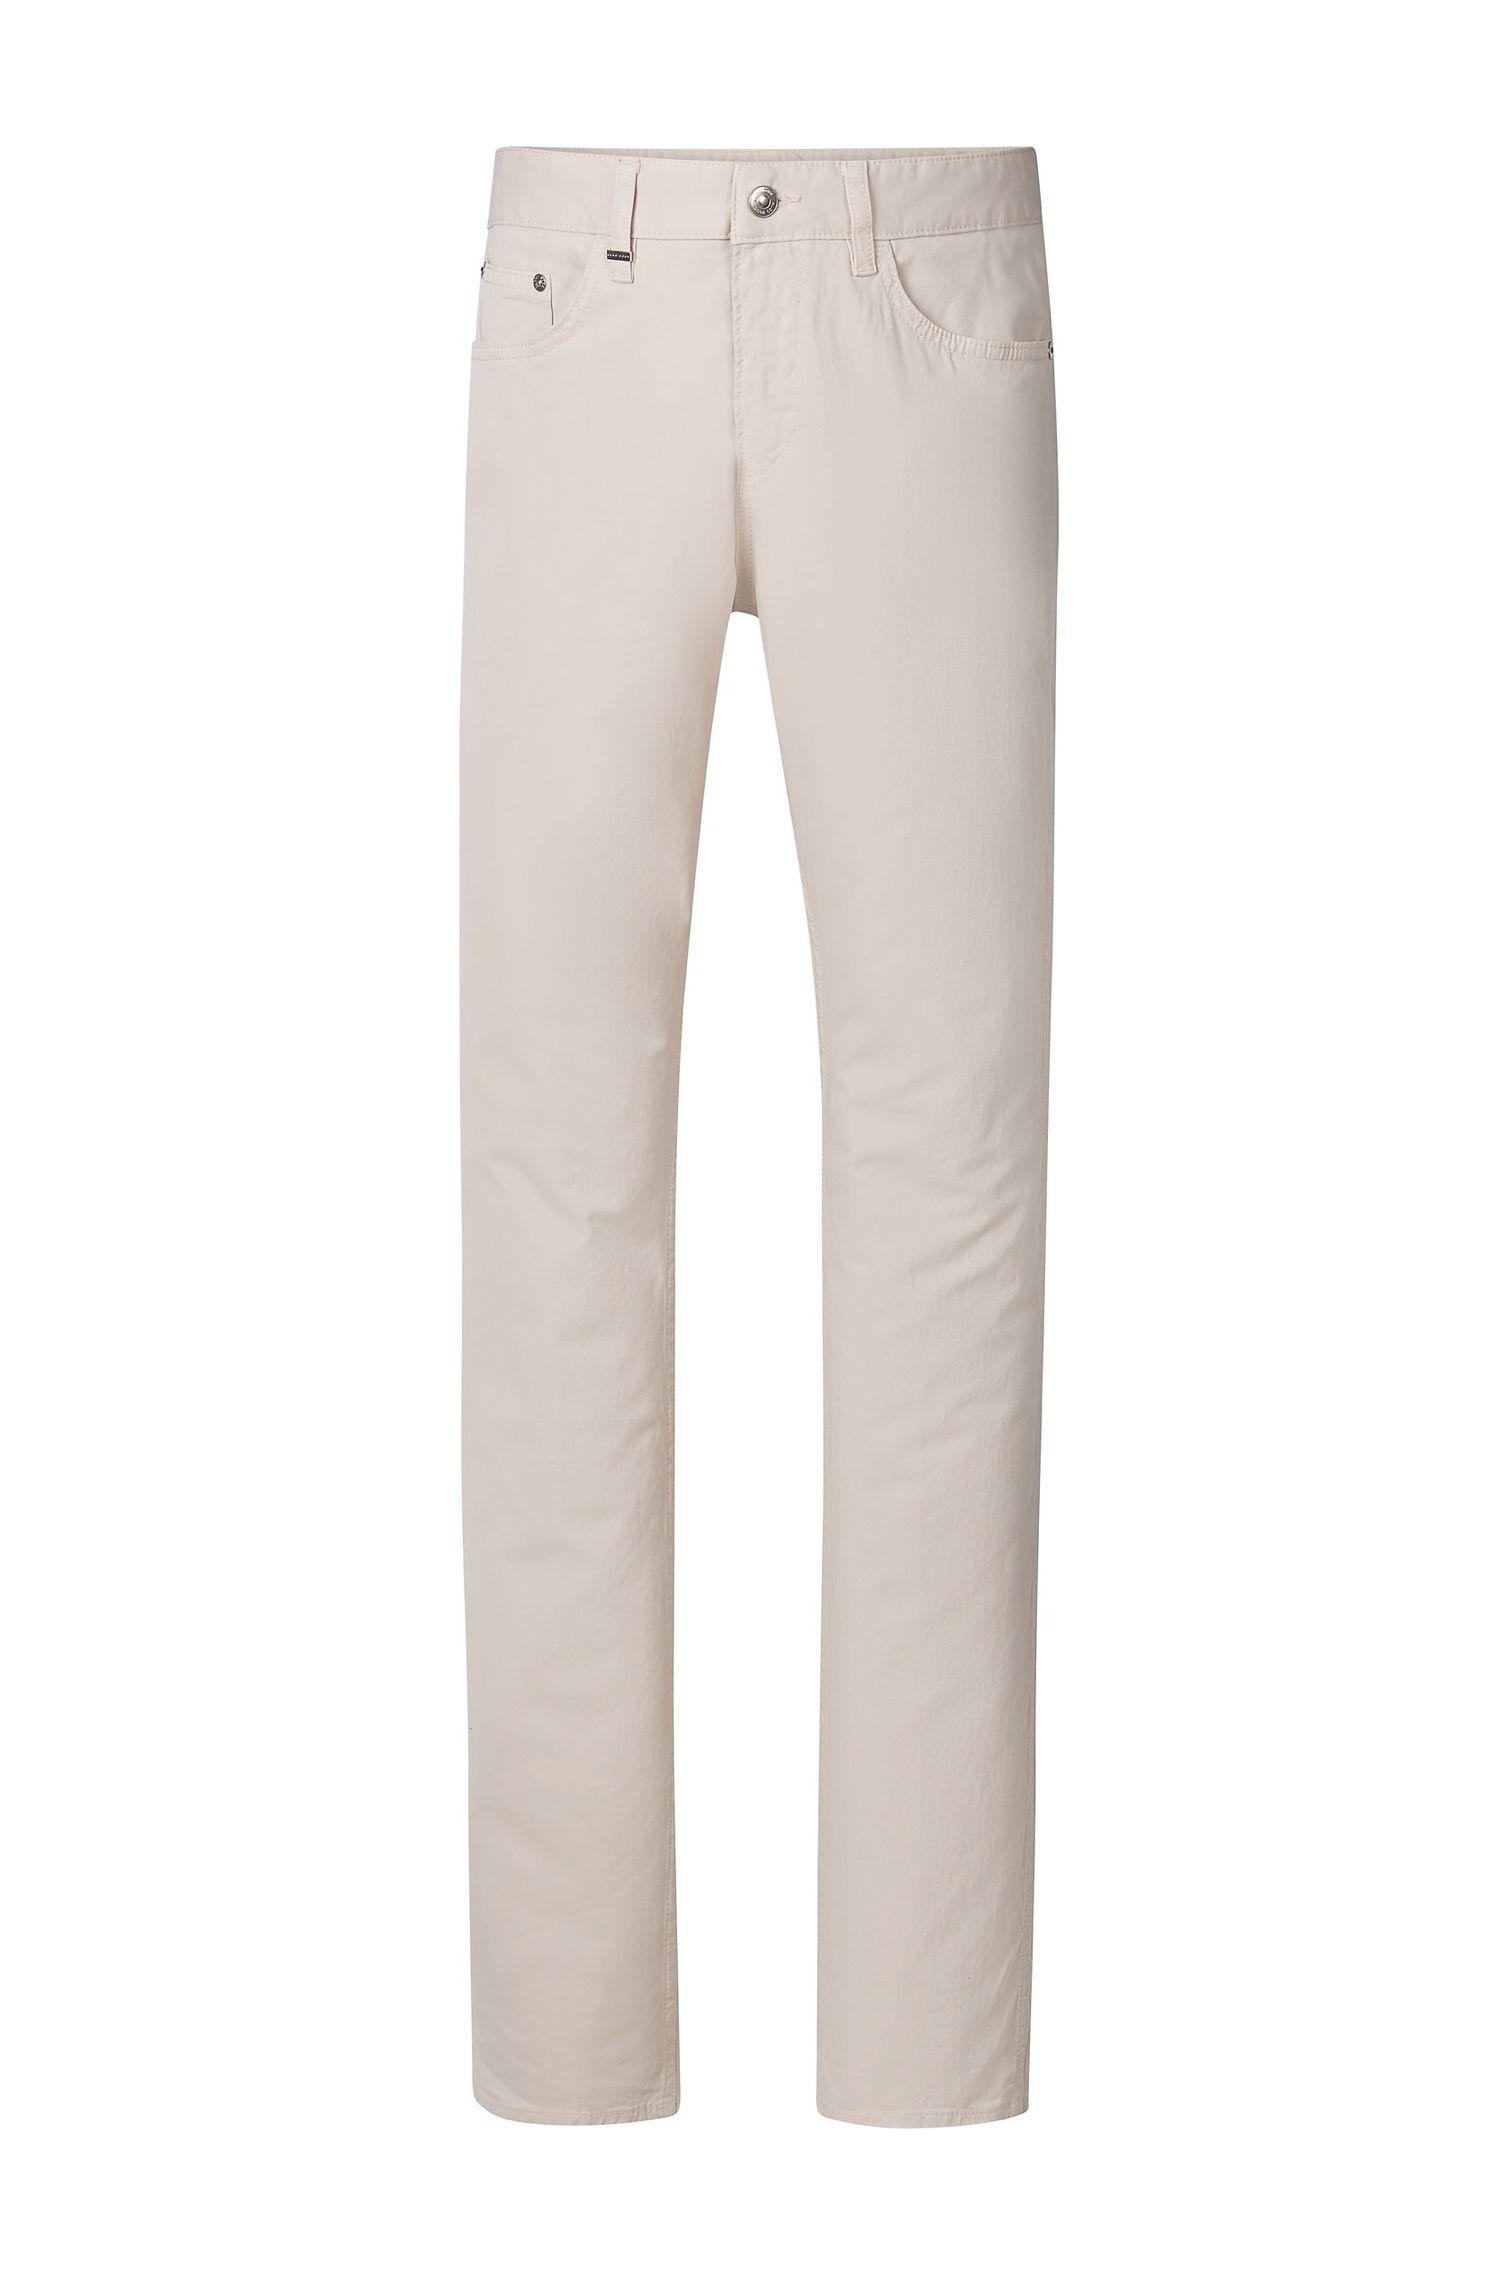 13 oz Stretch Cotton Jeans, Slim Fit   Delaware